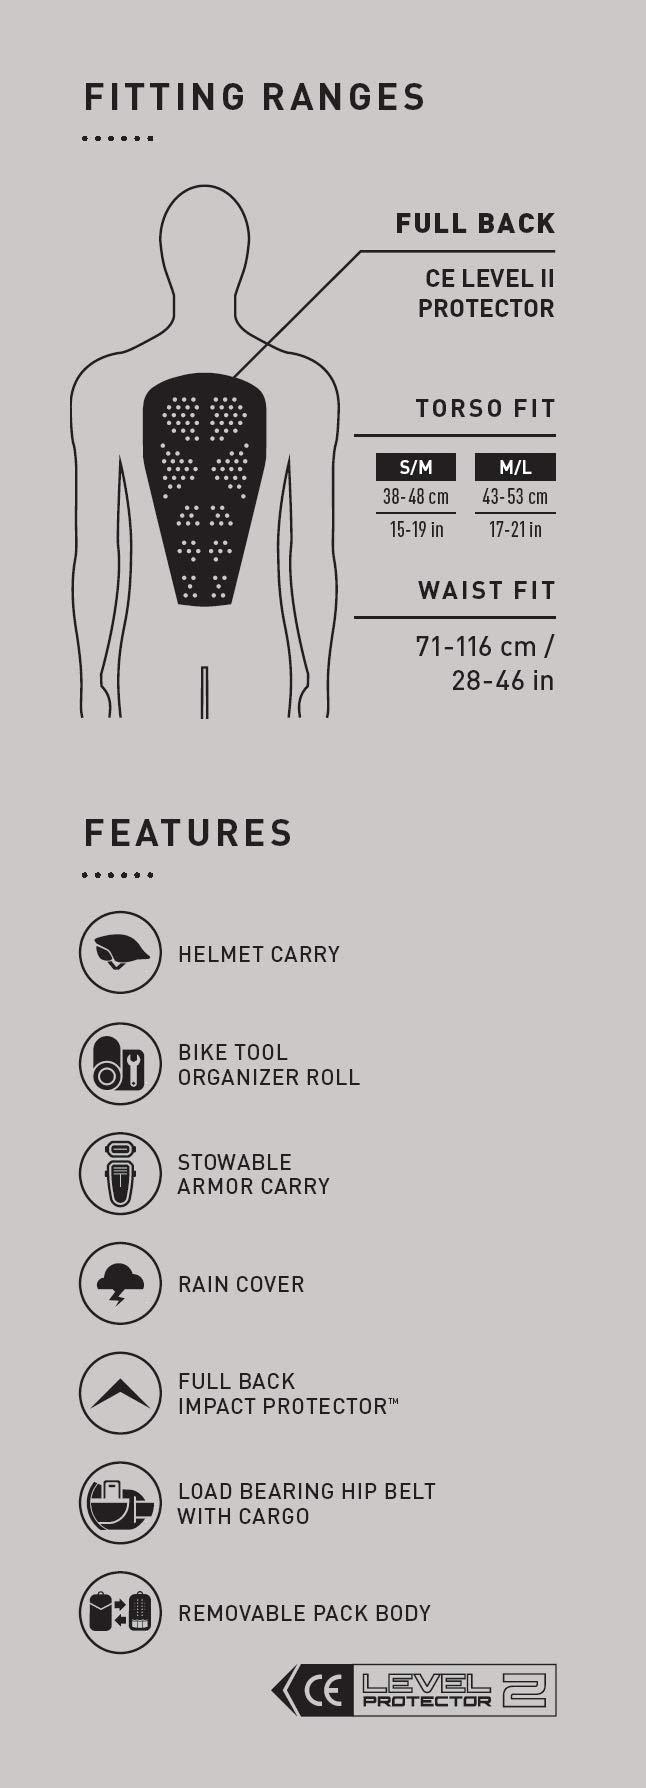 CamelBak Chase Bike Vest 50 oz Hydration Pack, Black